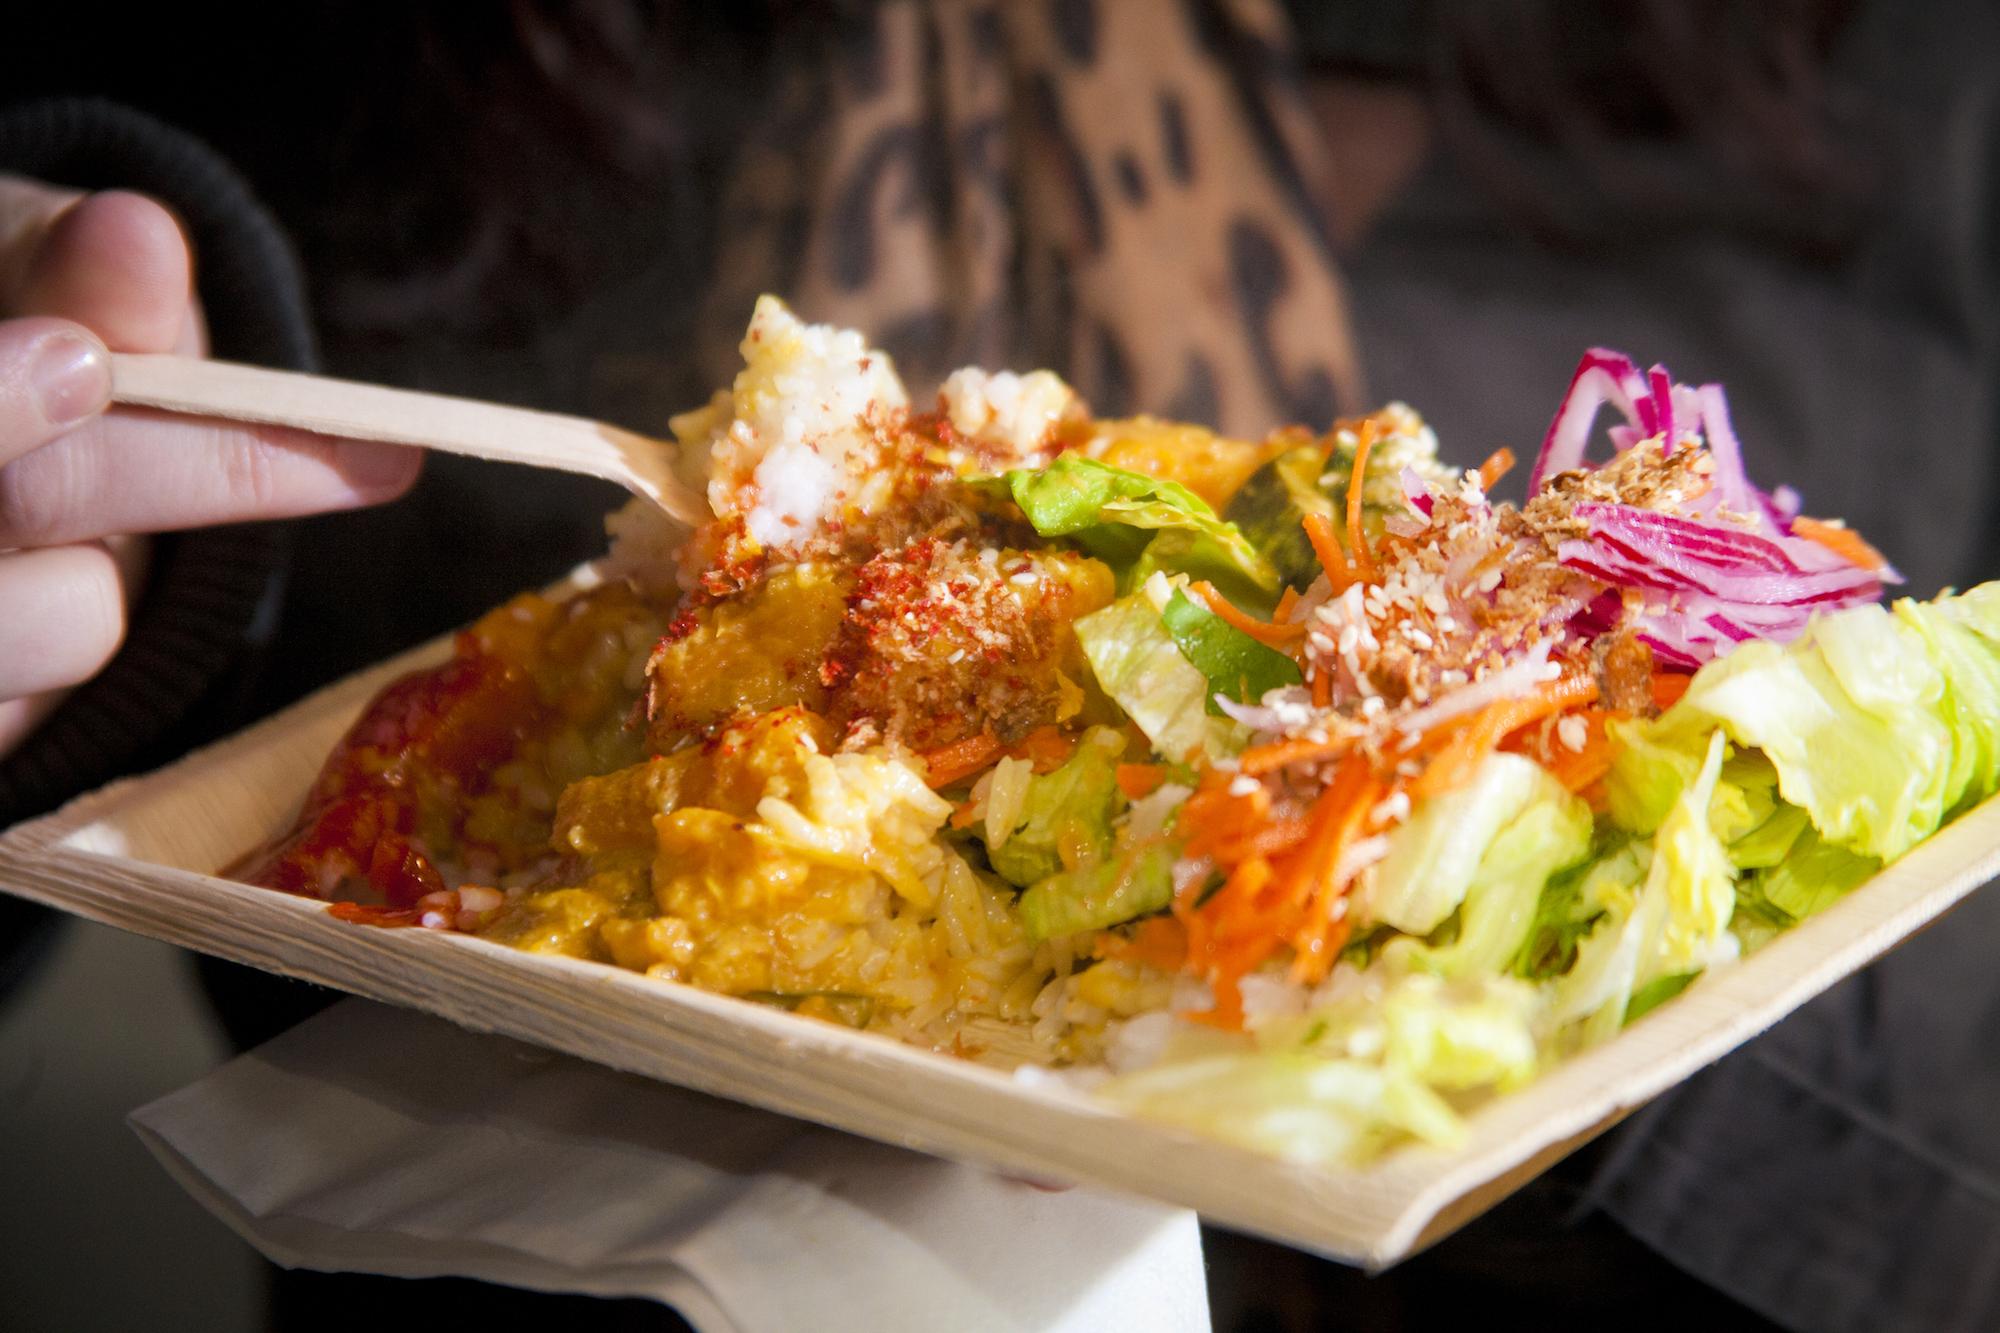 Canoodle street food